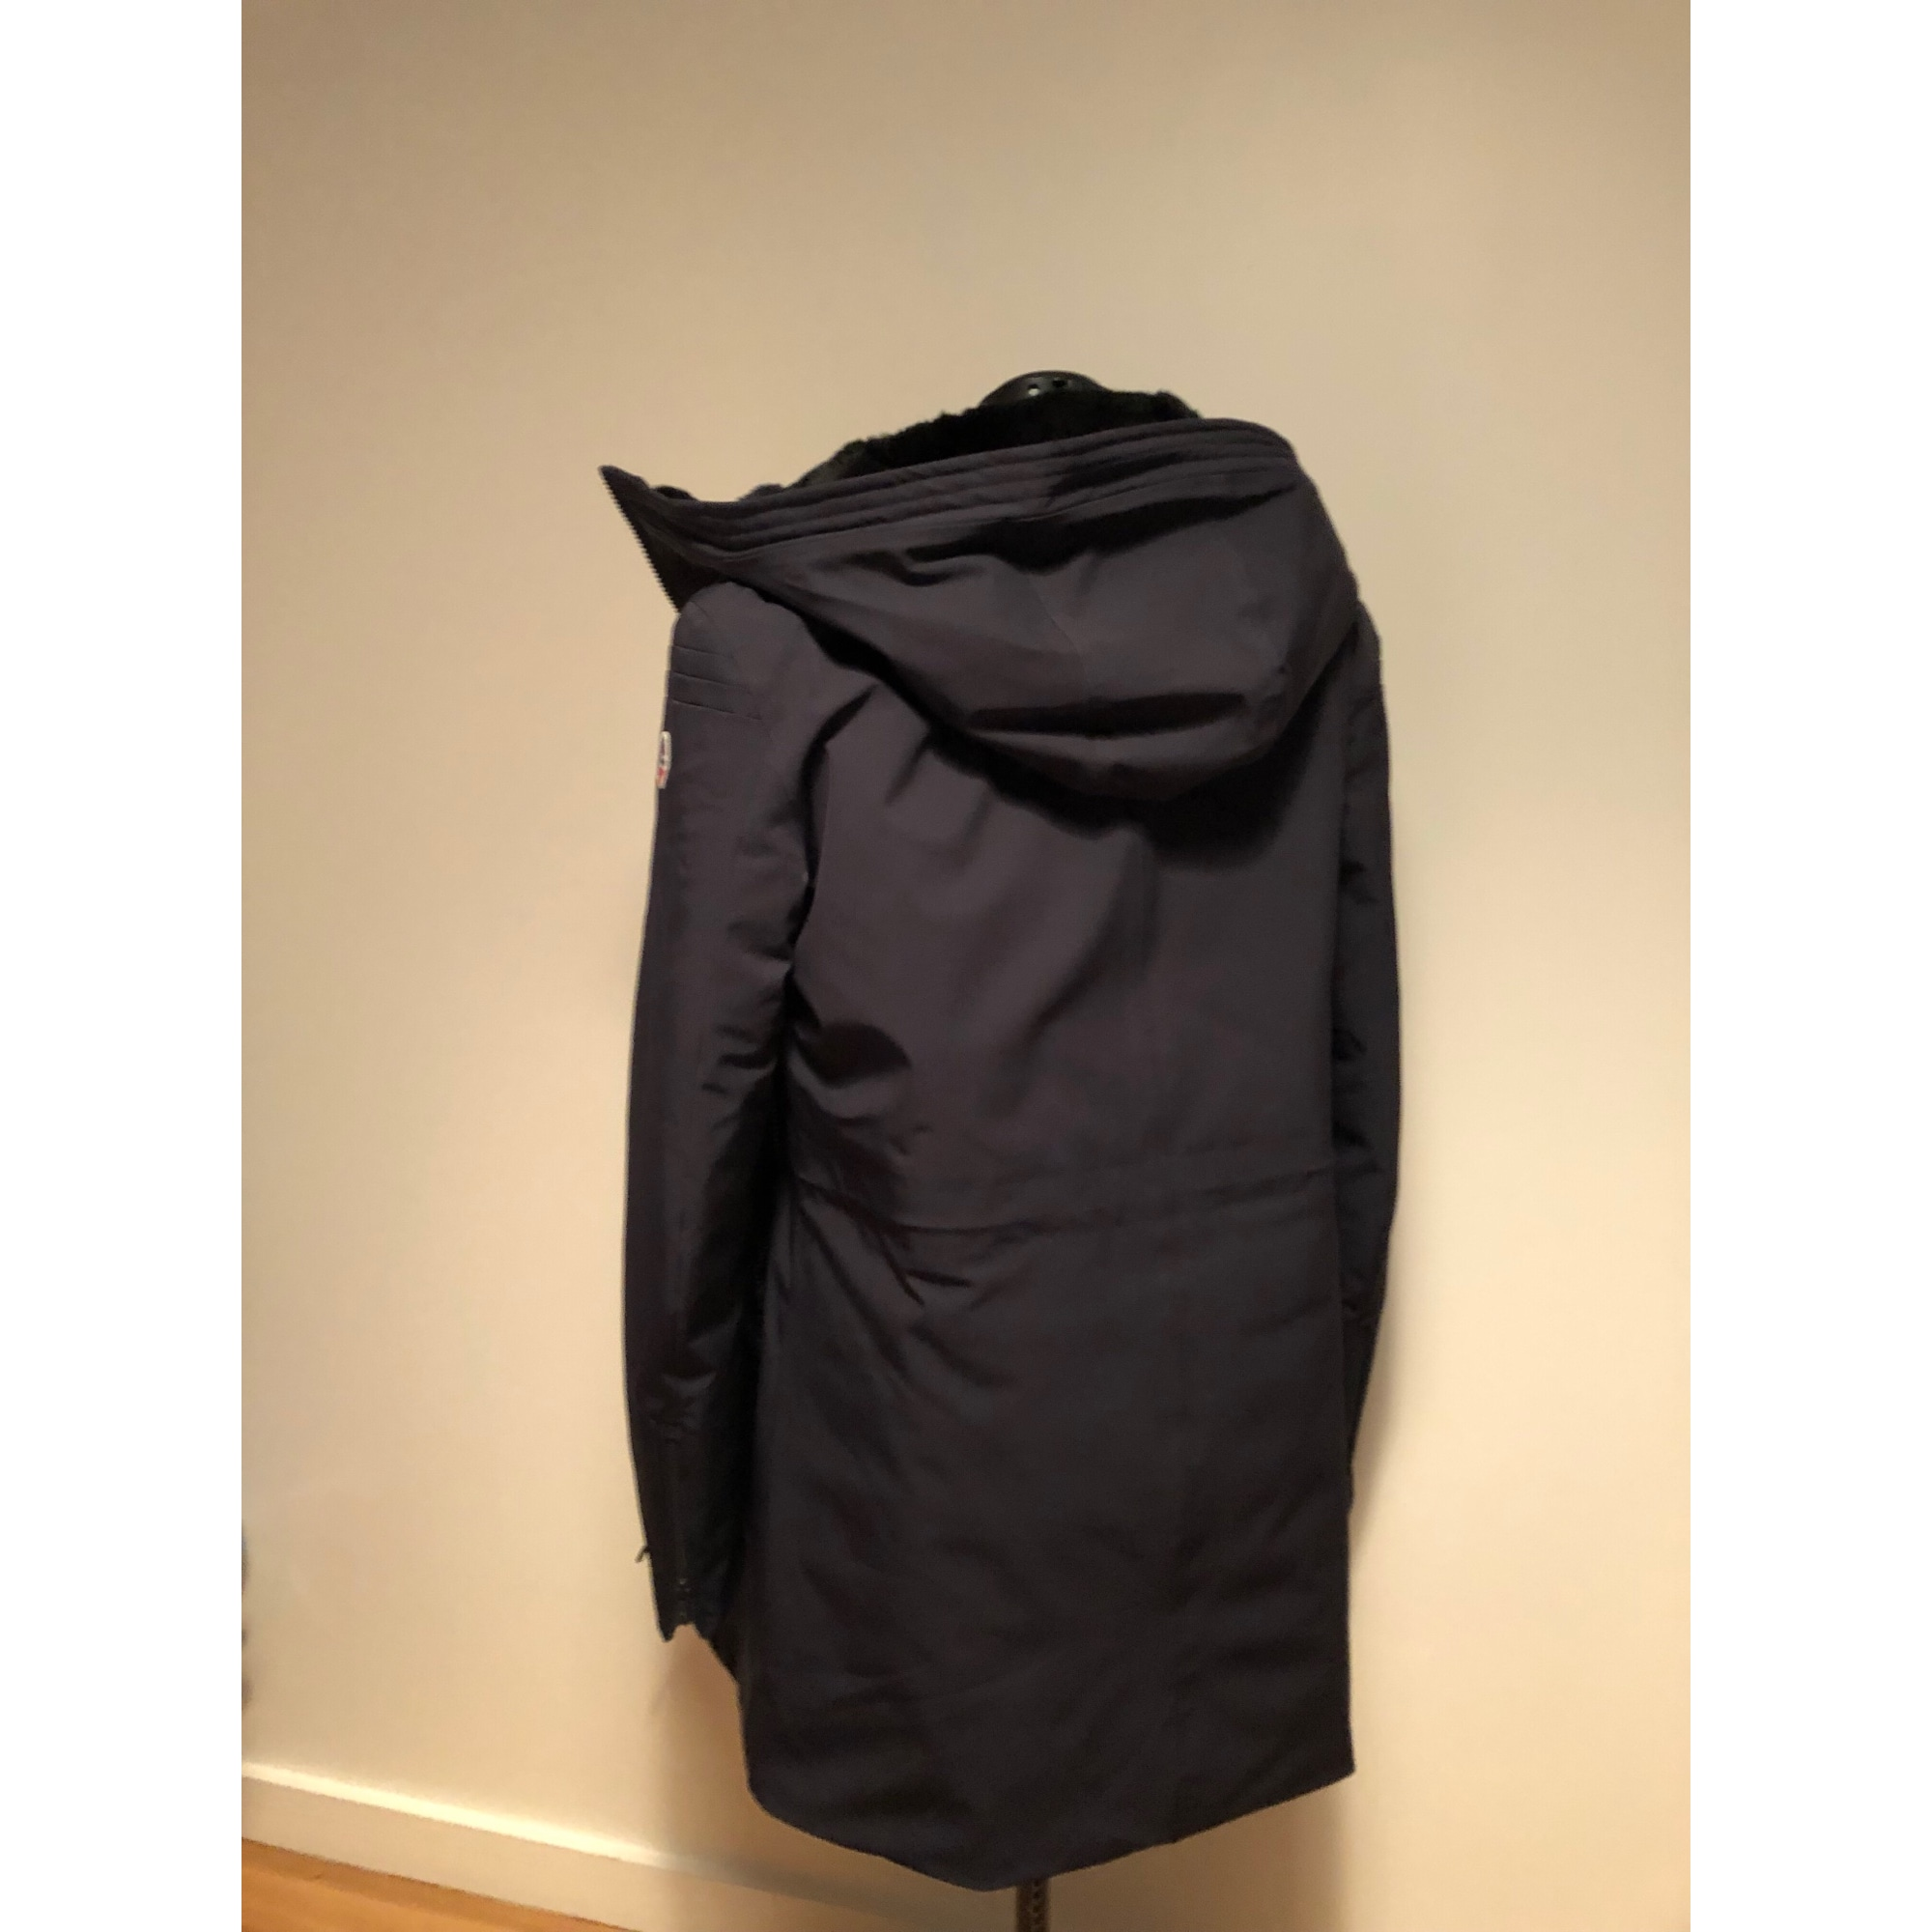 Manteau Giez Fur : Manteau masculin garni de duvet de canard